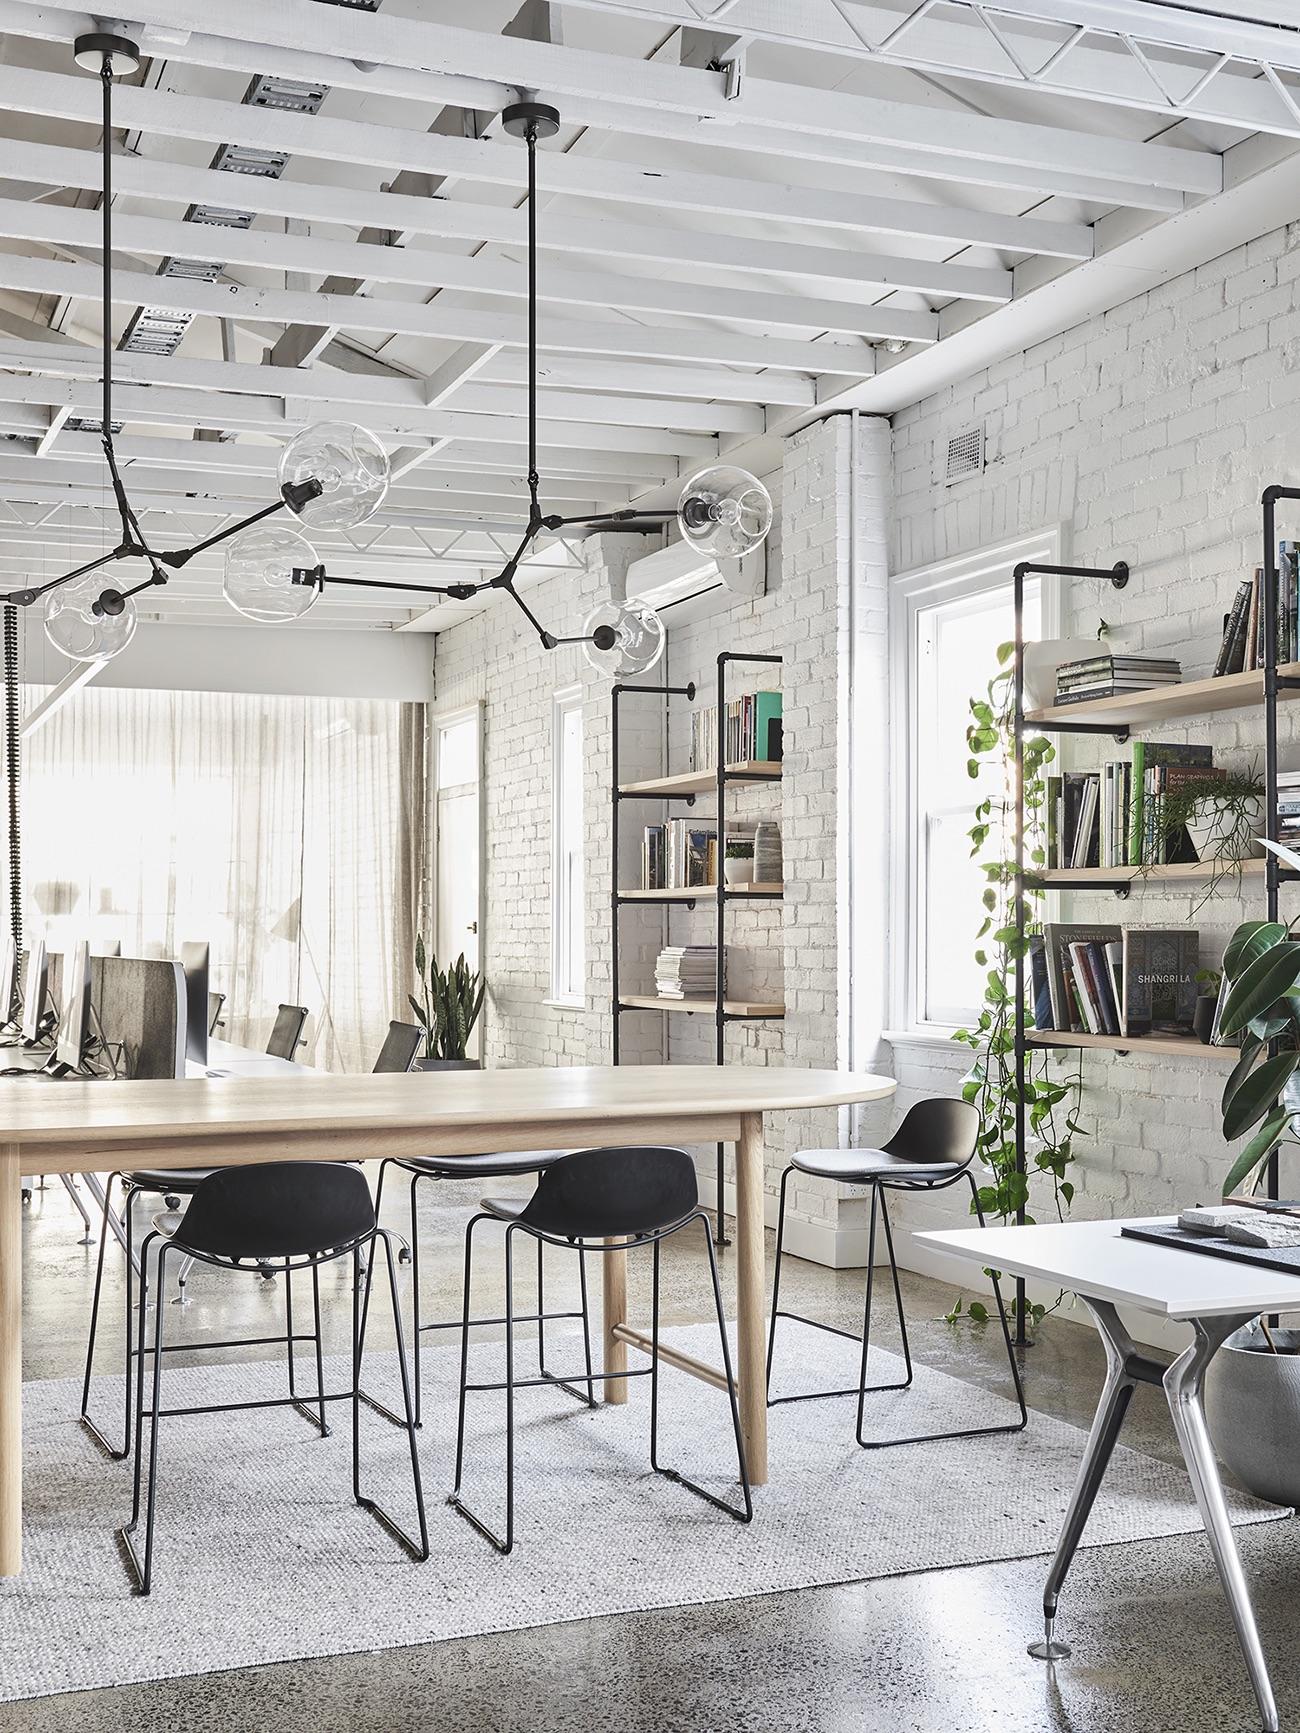 dwa-nbd-studio-office-7